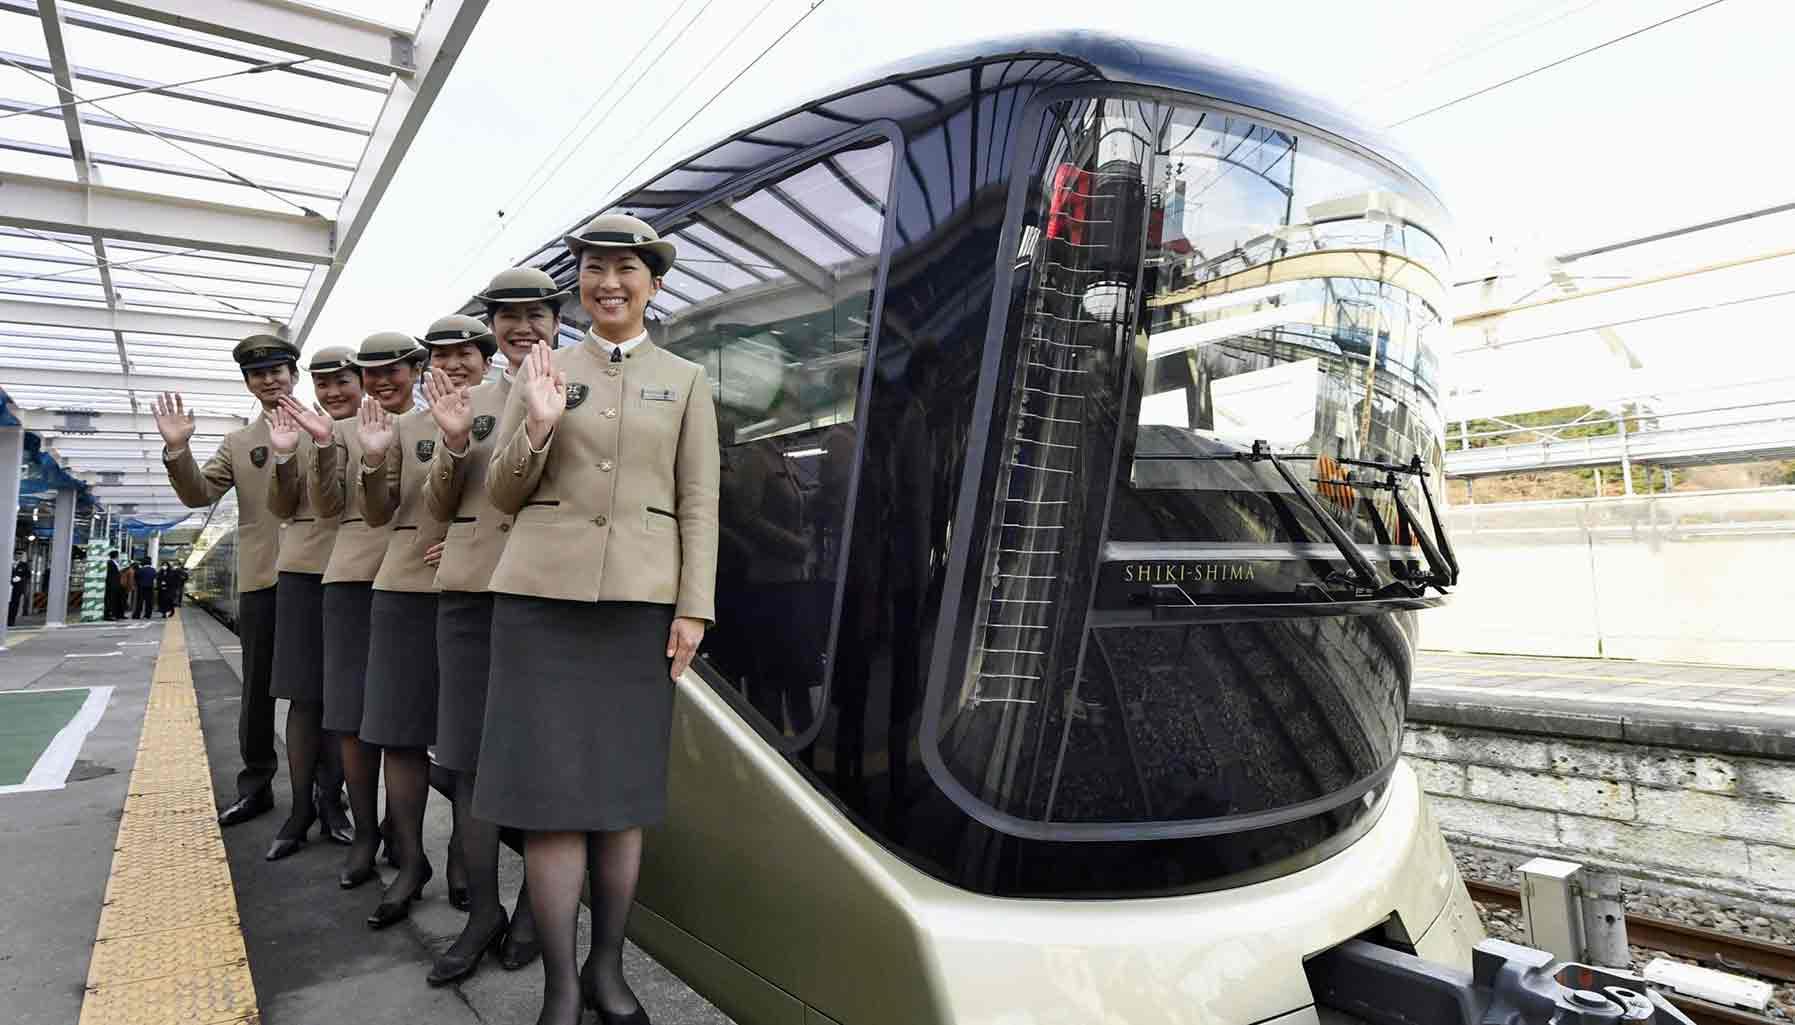 Shinki-Shima Train